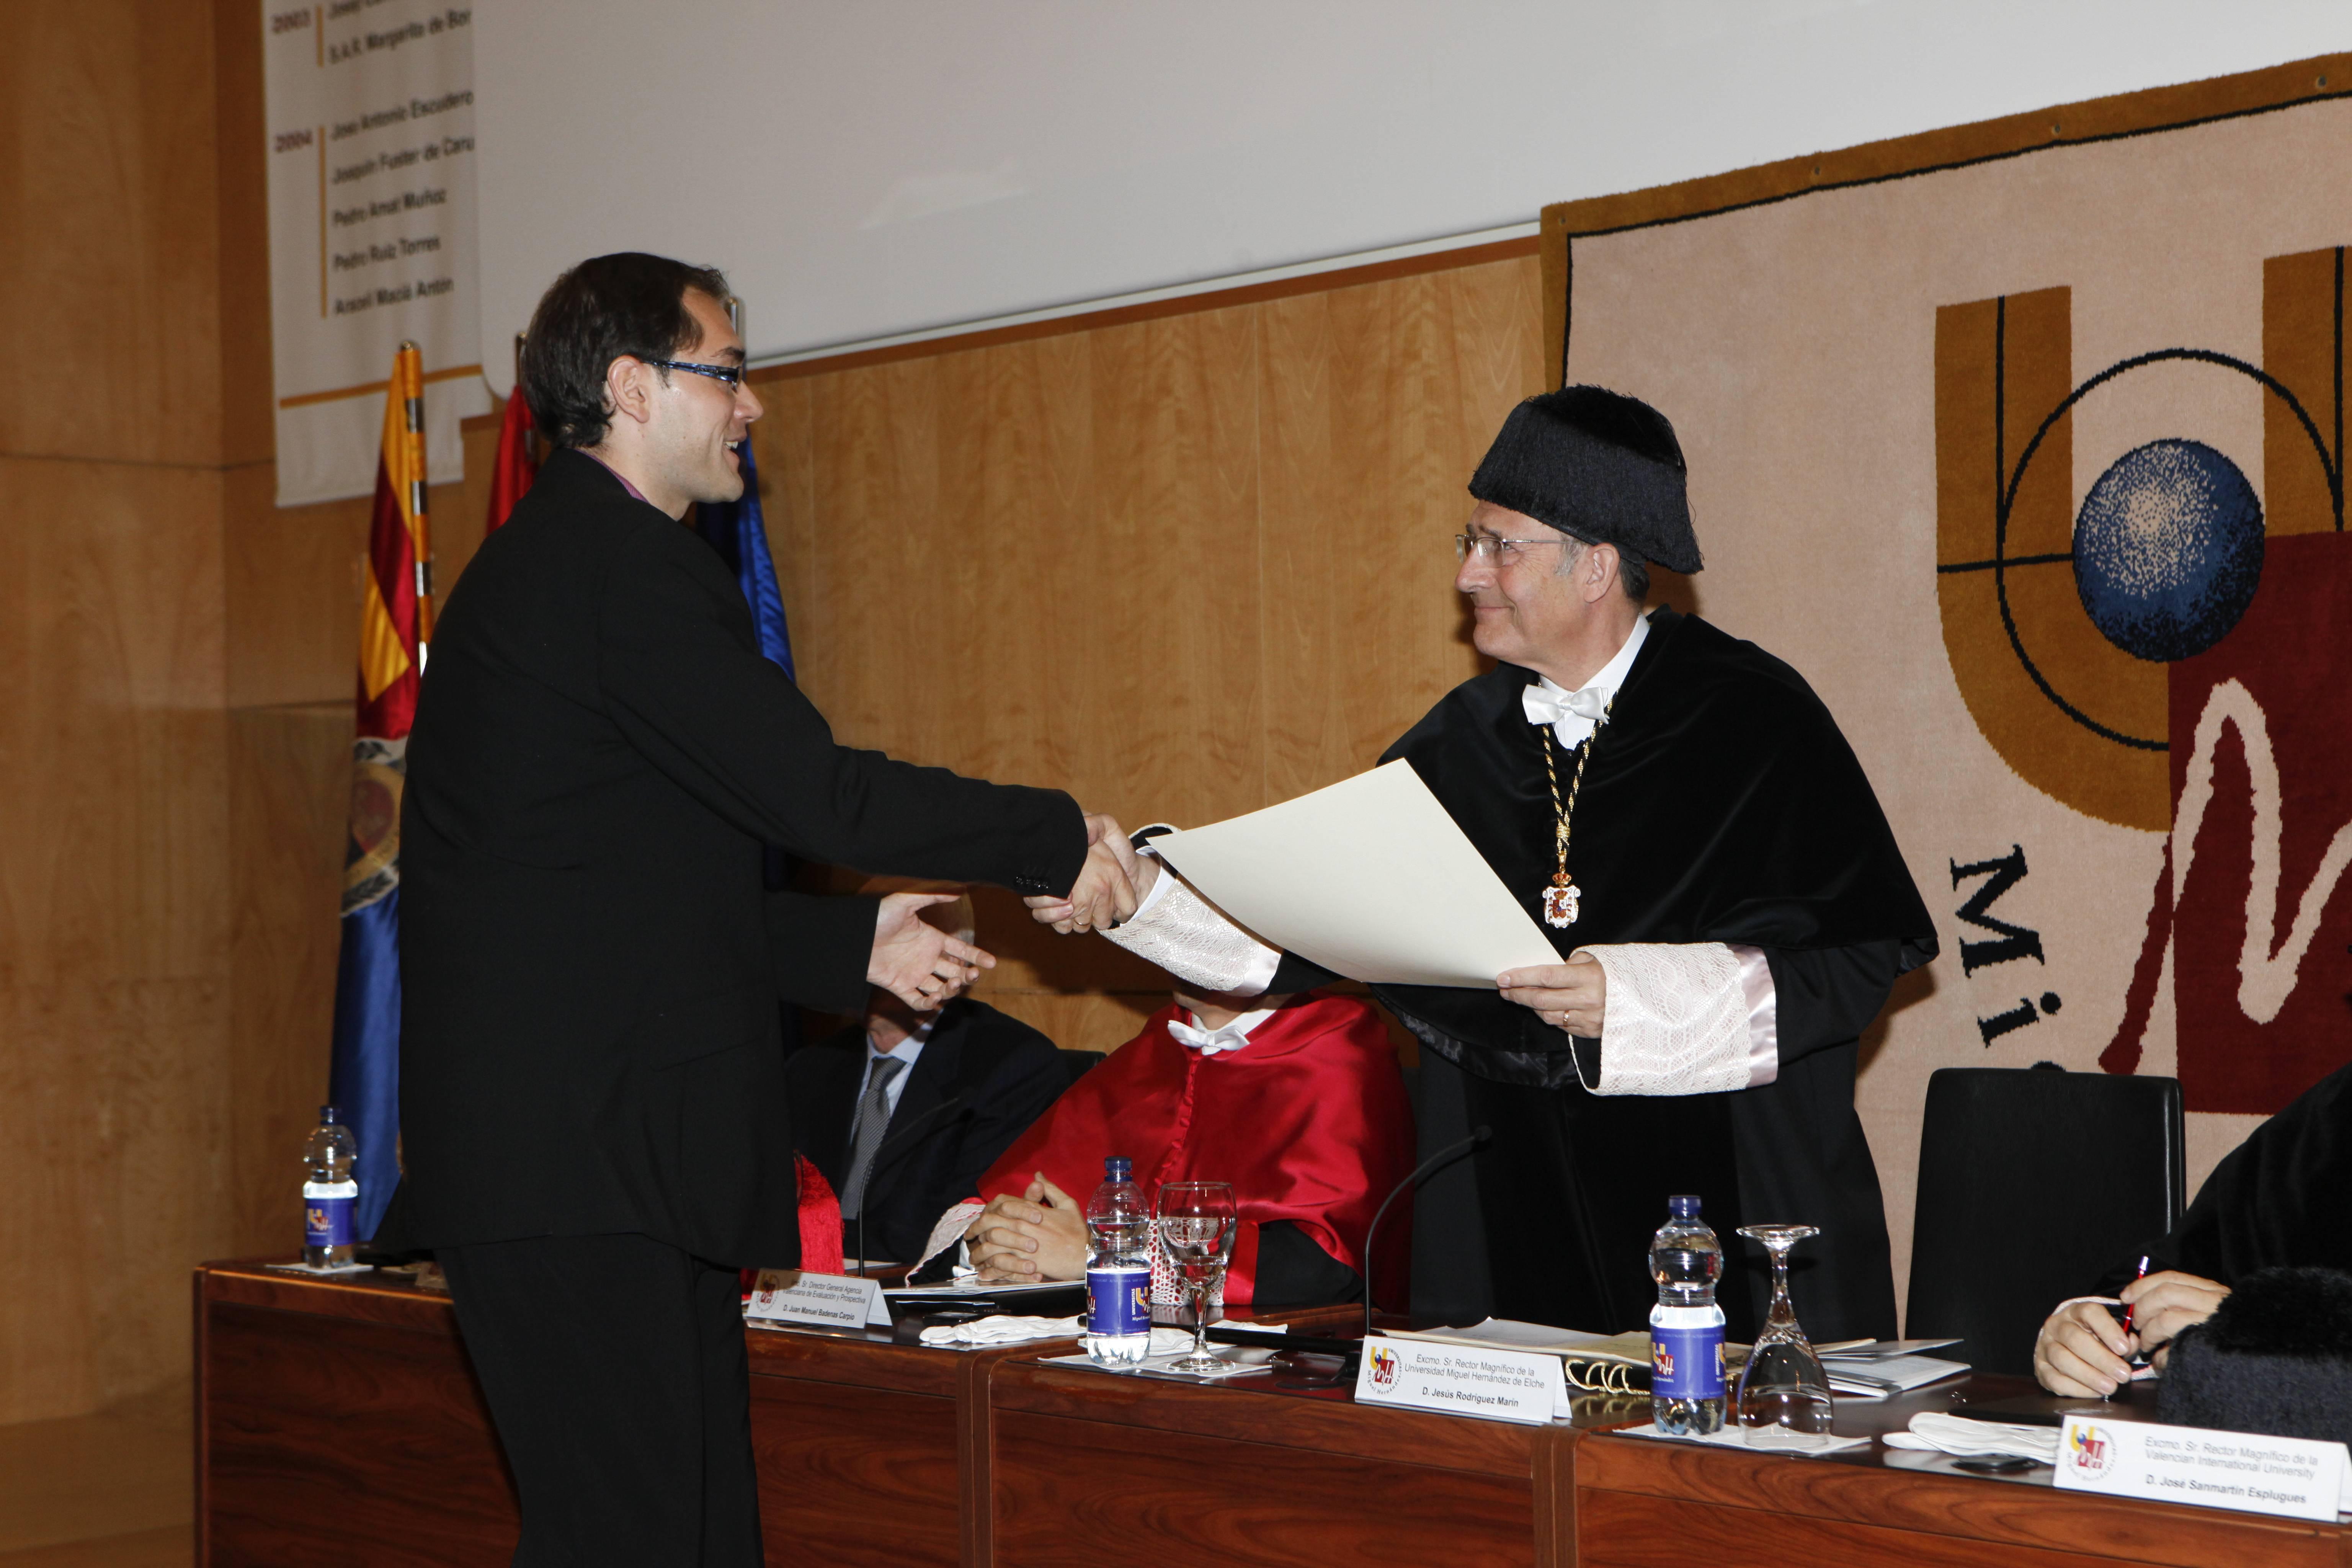 doctor-honoris-causa-luis-gamir_mg_1034.jpg